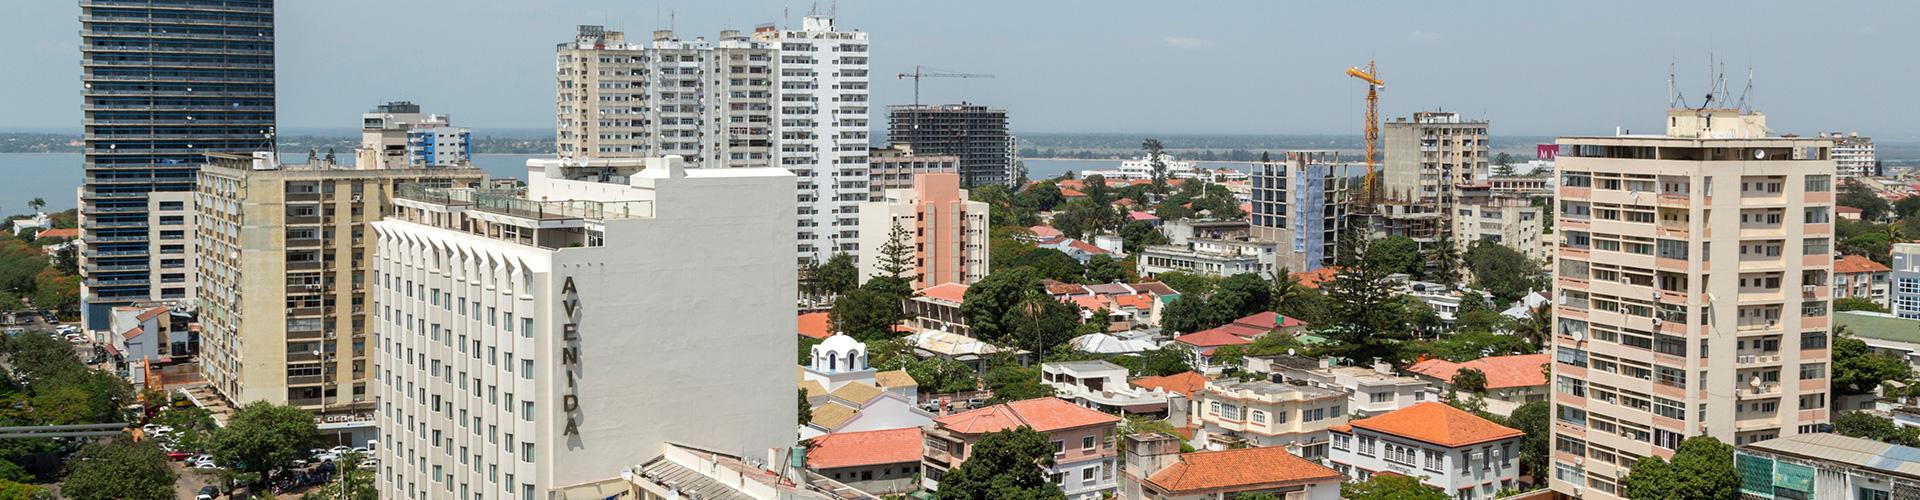 Aerial photo of Maputo